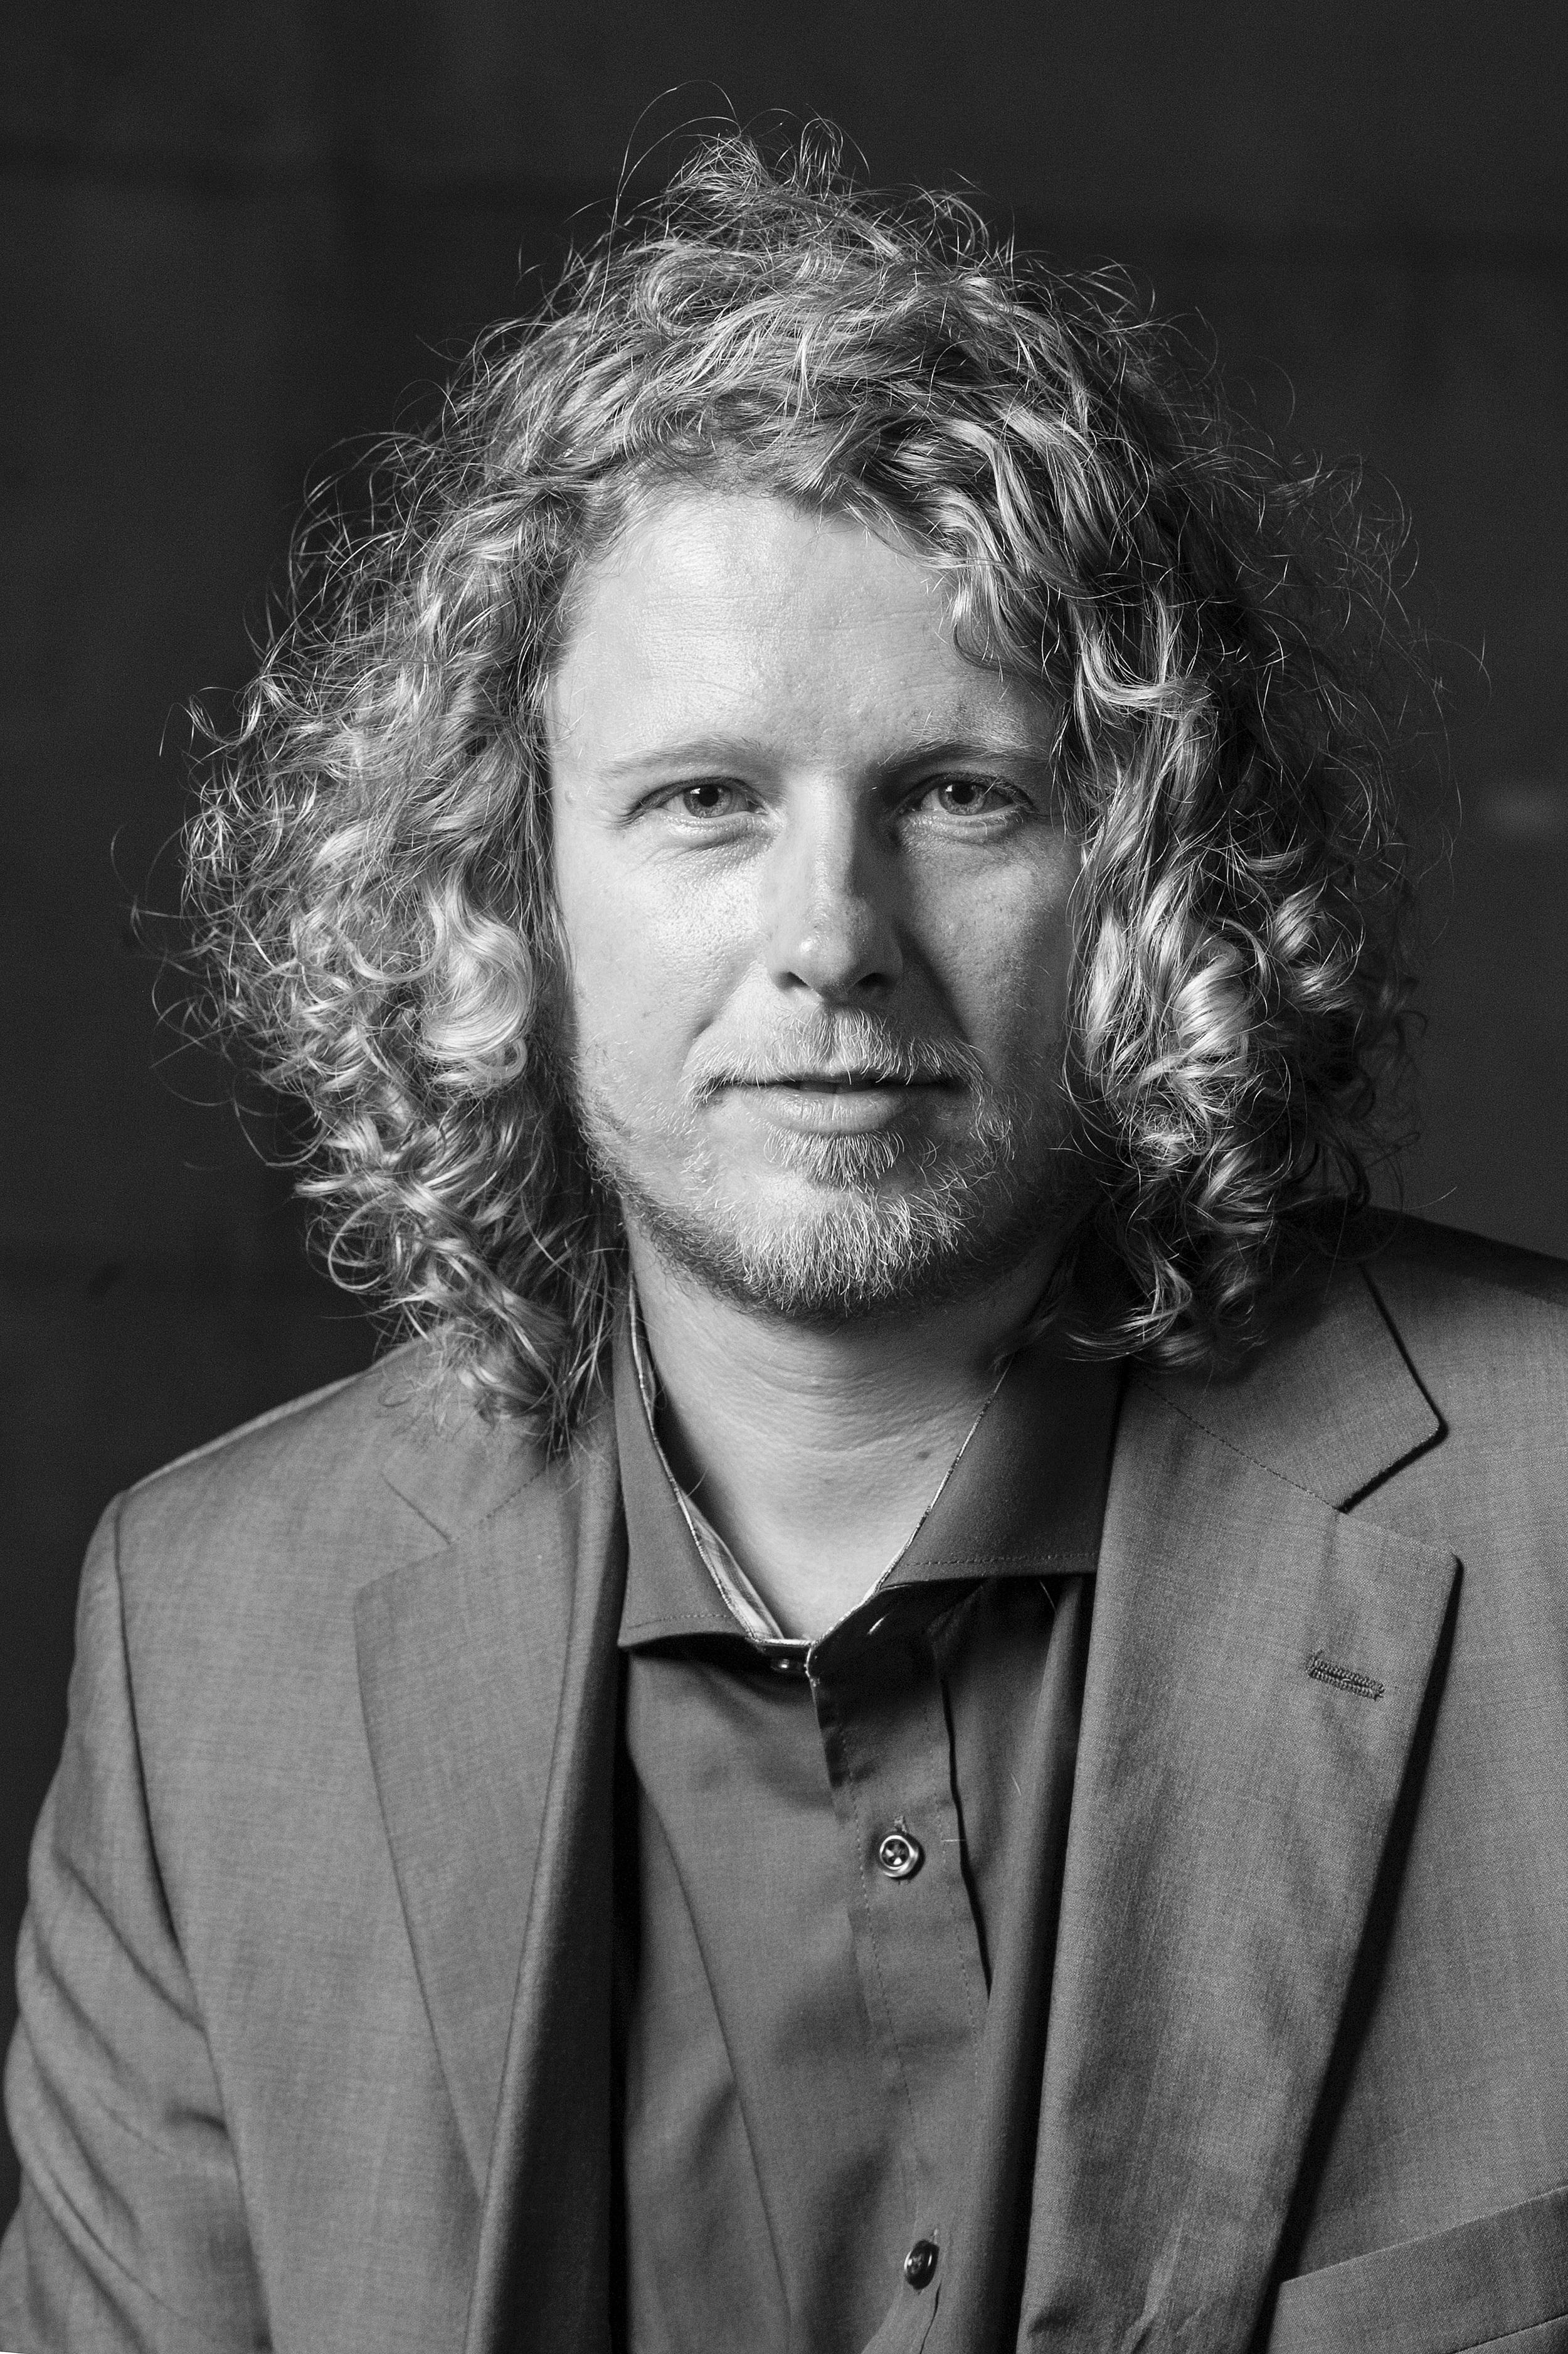 Fredrik Brattberg